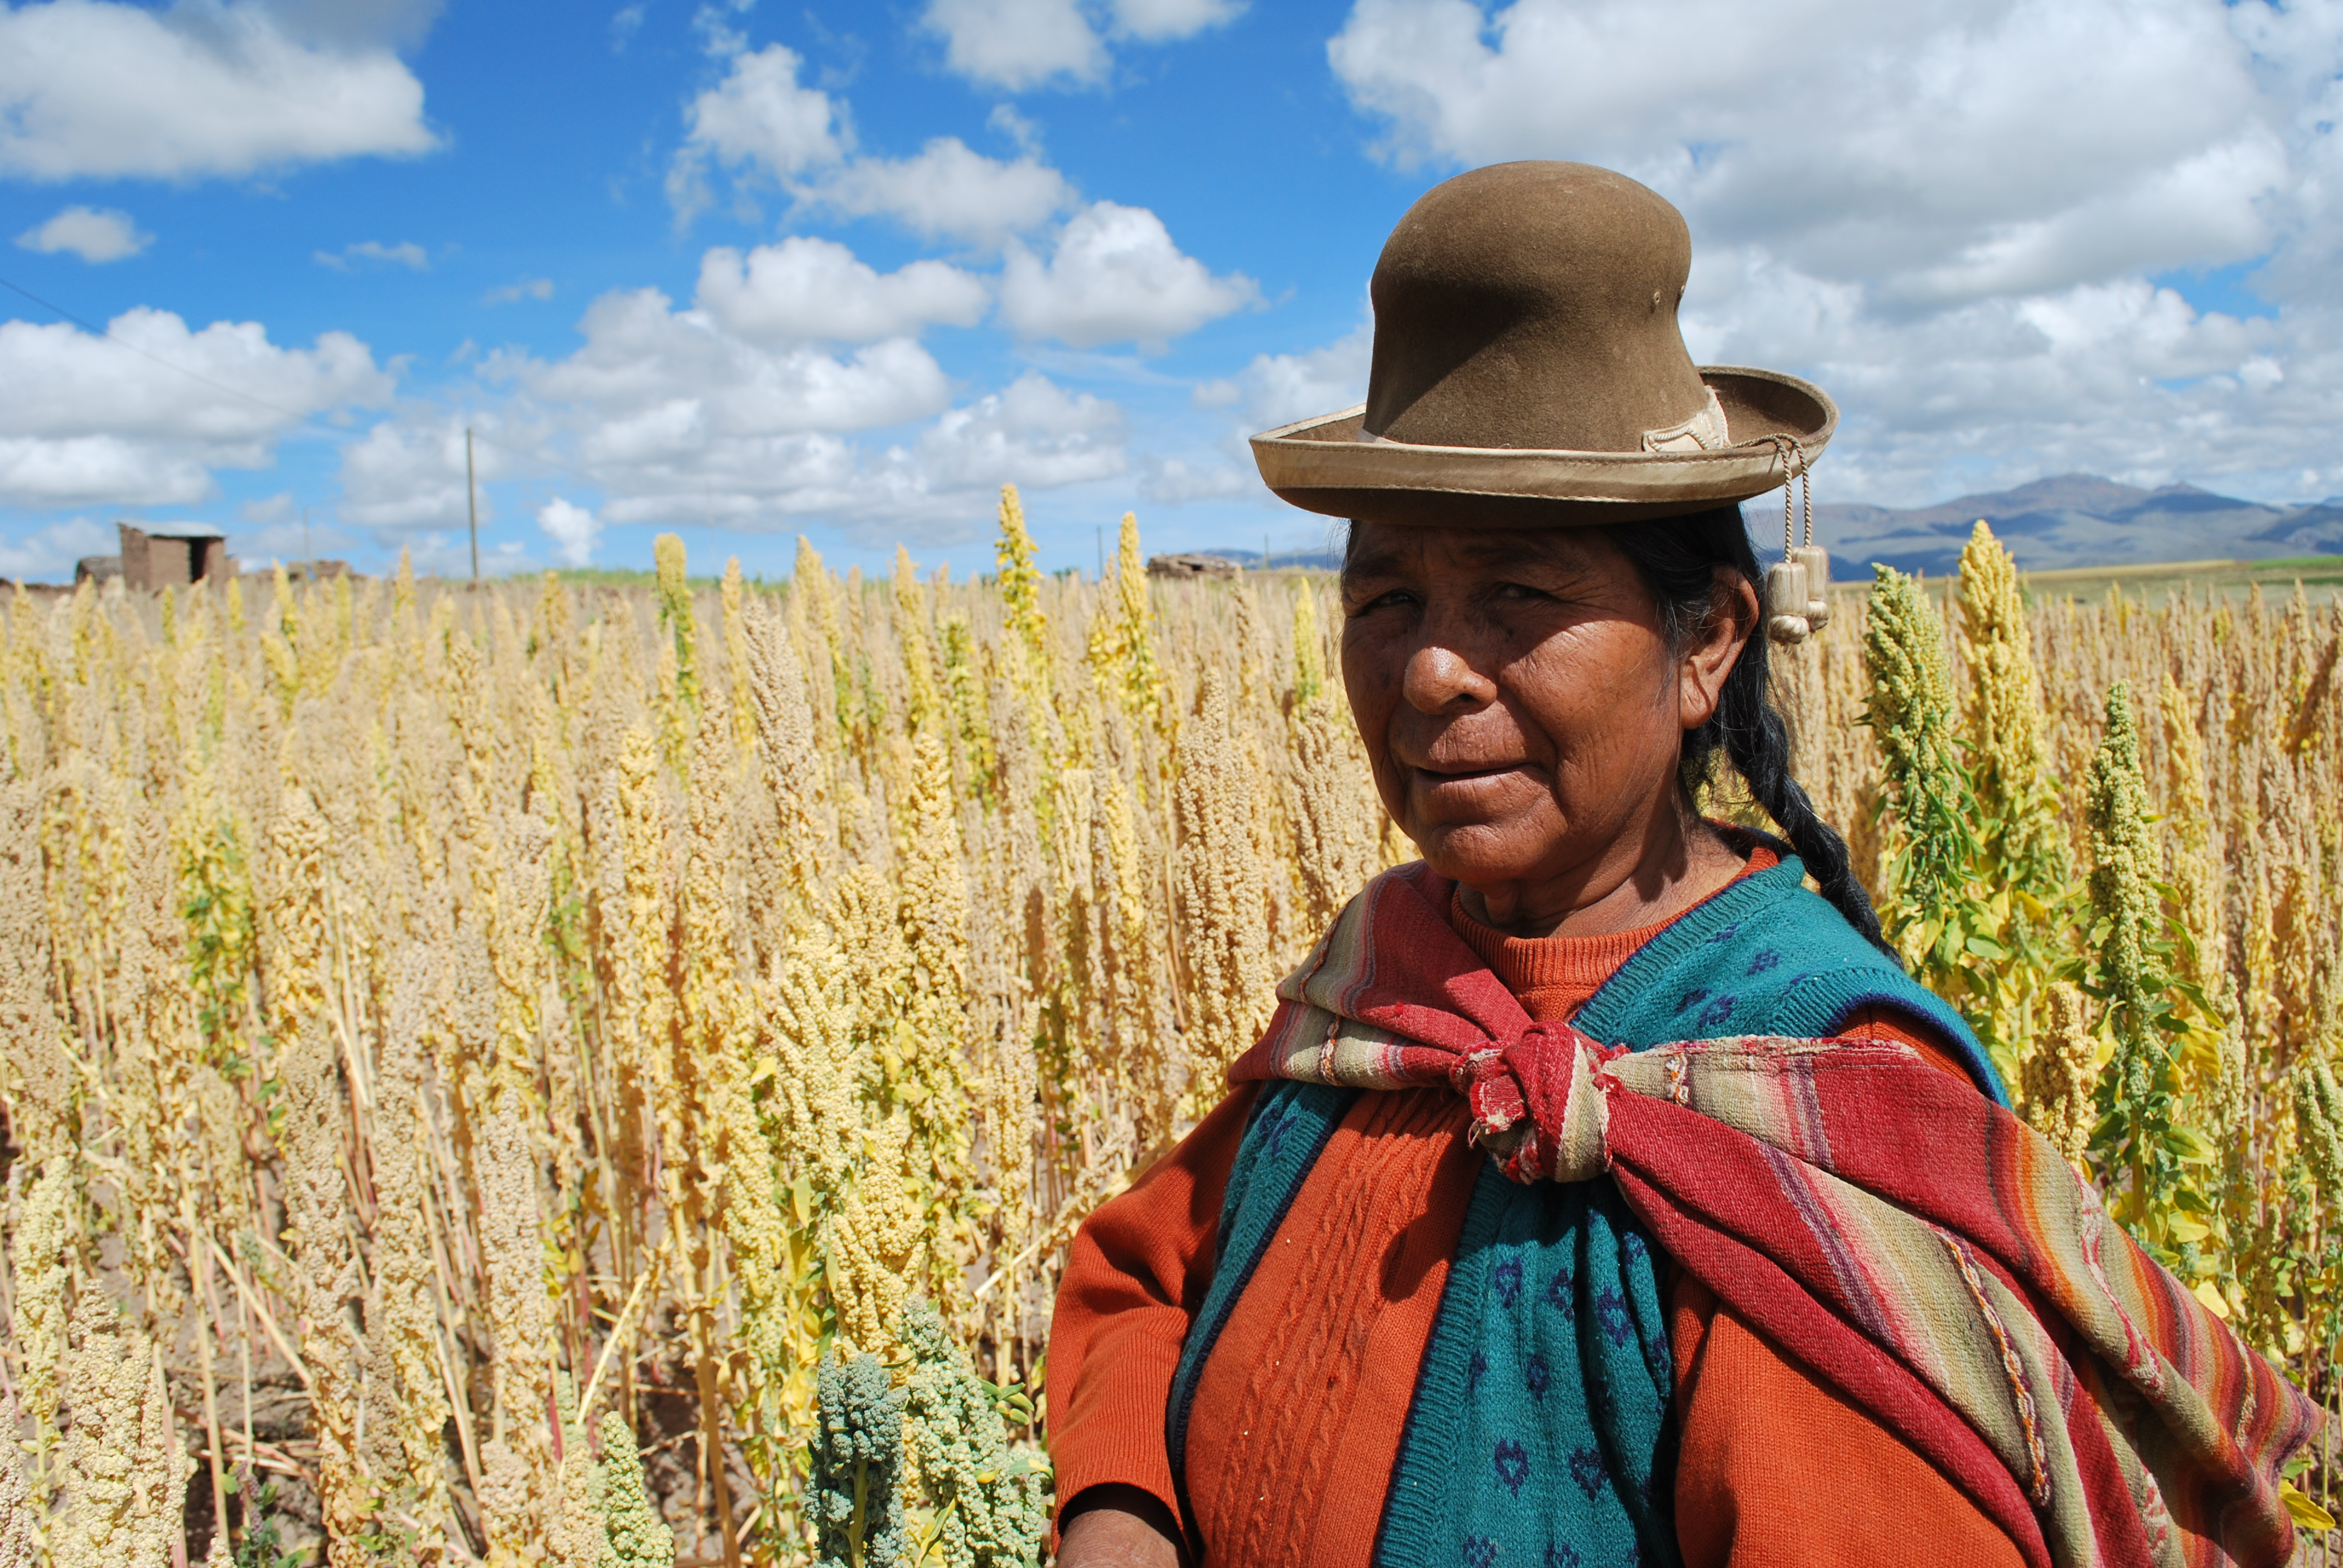 "Figure 2: Bolivian farmer in Quinoa field. Image: {a href=""https://www.flickr.com/photos/bioversity/6673223343/in/photolist-baG1NT-rUM6V4-baCbk4-dPxEty-6anLWD-muoNsR-f56NGm-6W8qU3-9o6E8P-6anLWr-6arXby-qQWmGv-qQWwmR-qQSth4-qQMfFG-66haf3-r8hmCS-r8fvRA-qQWk3P-qQWs78-r8drxP-ds6qo6-6anLWk-6WZVV6-bzwY4b-oHJQPj-""}Bioversity International{/a}"